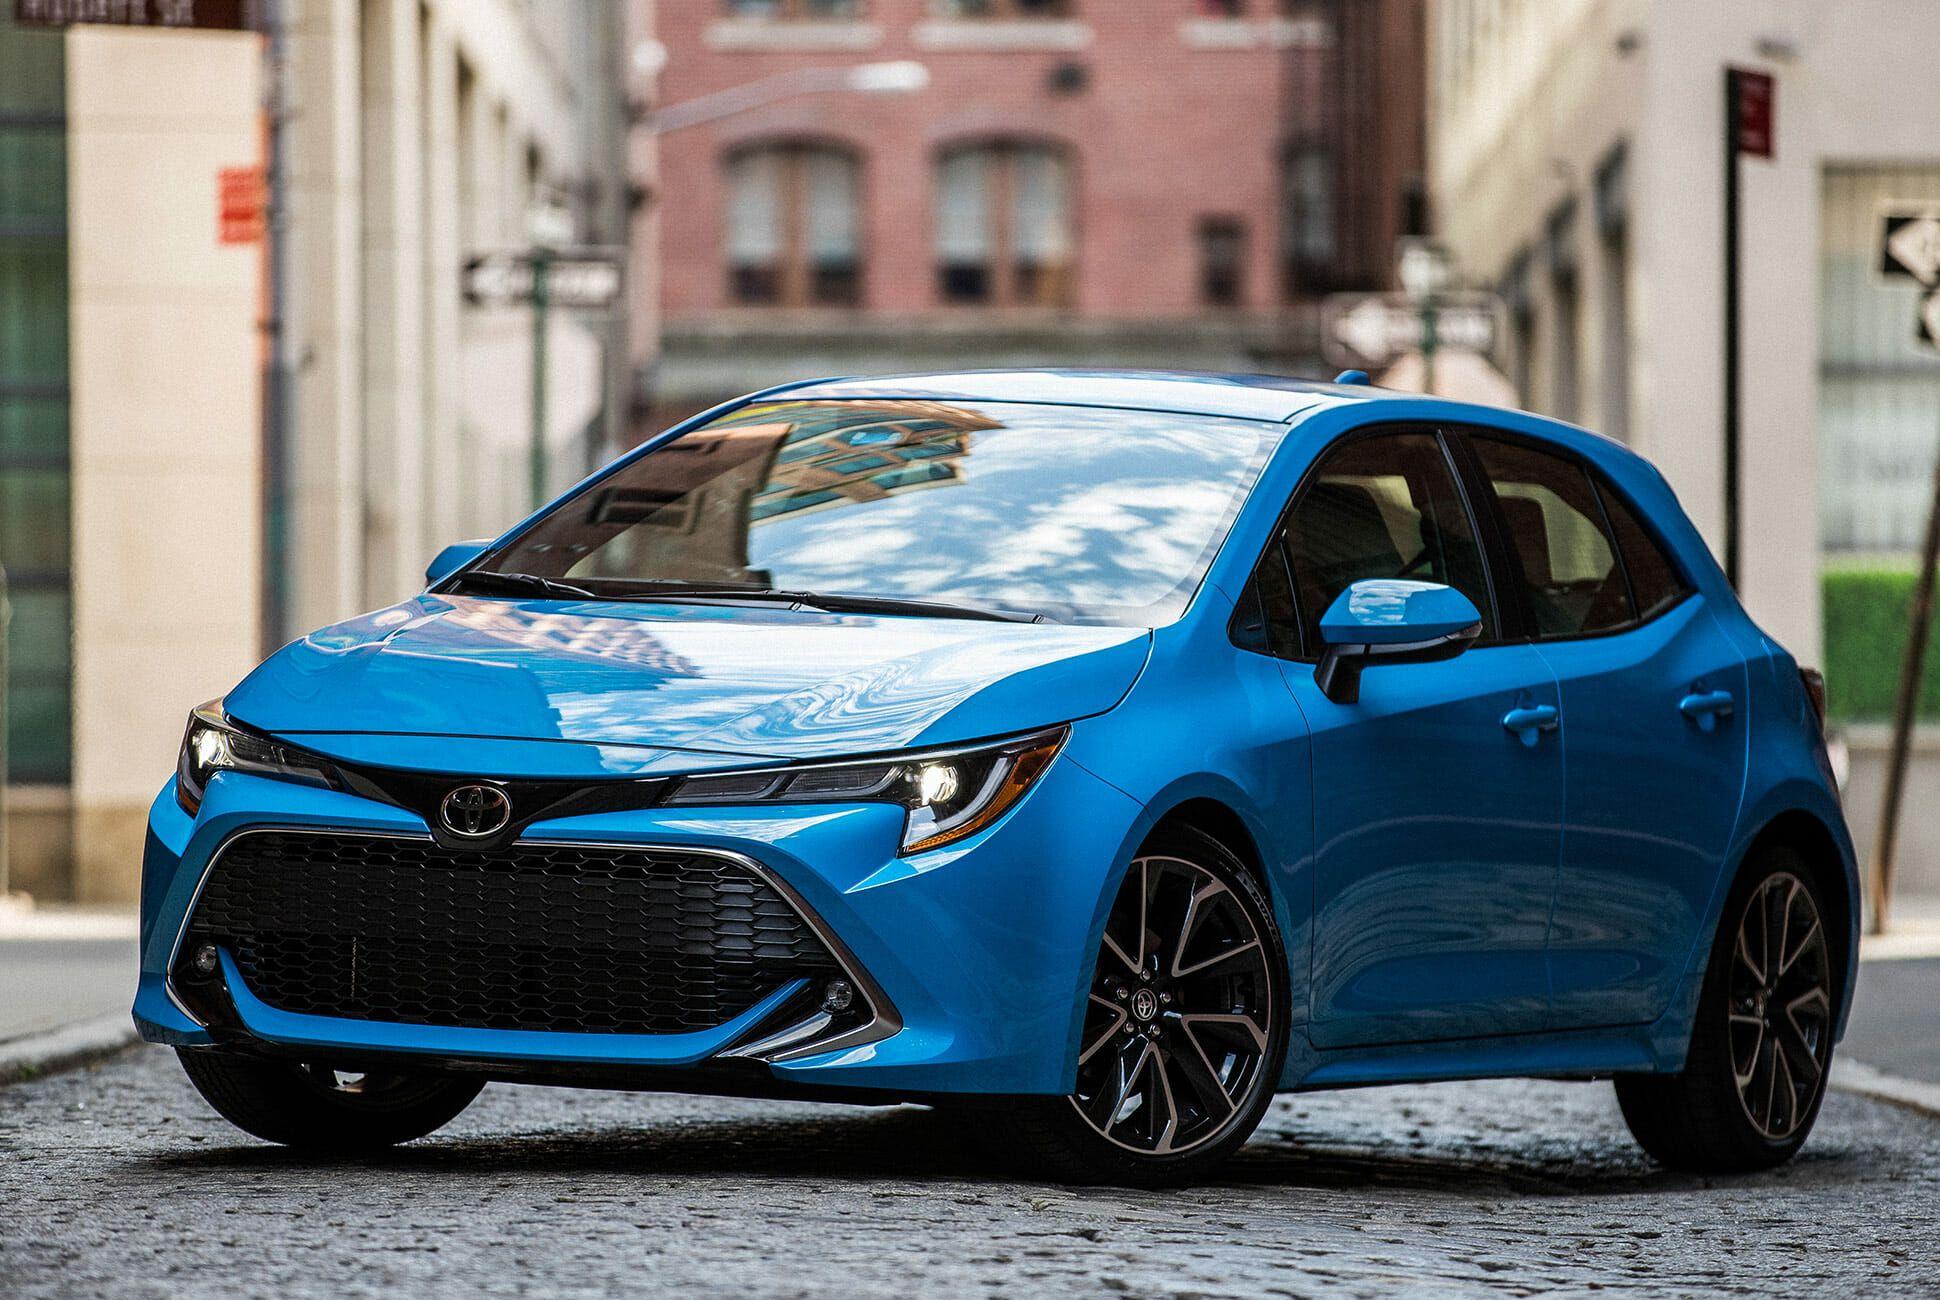 Toyota-Corolla-XSE-Hatch-Review-gear-patrol-slide-1